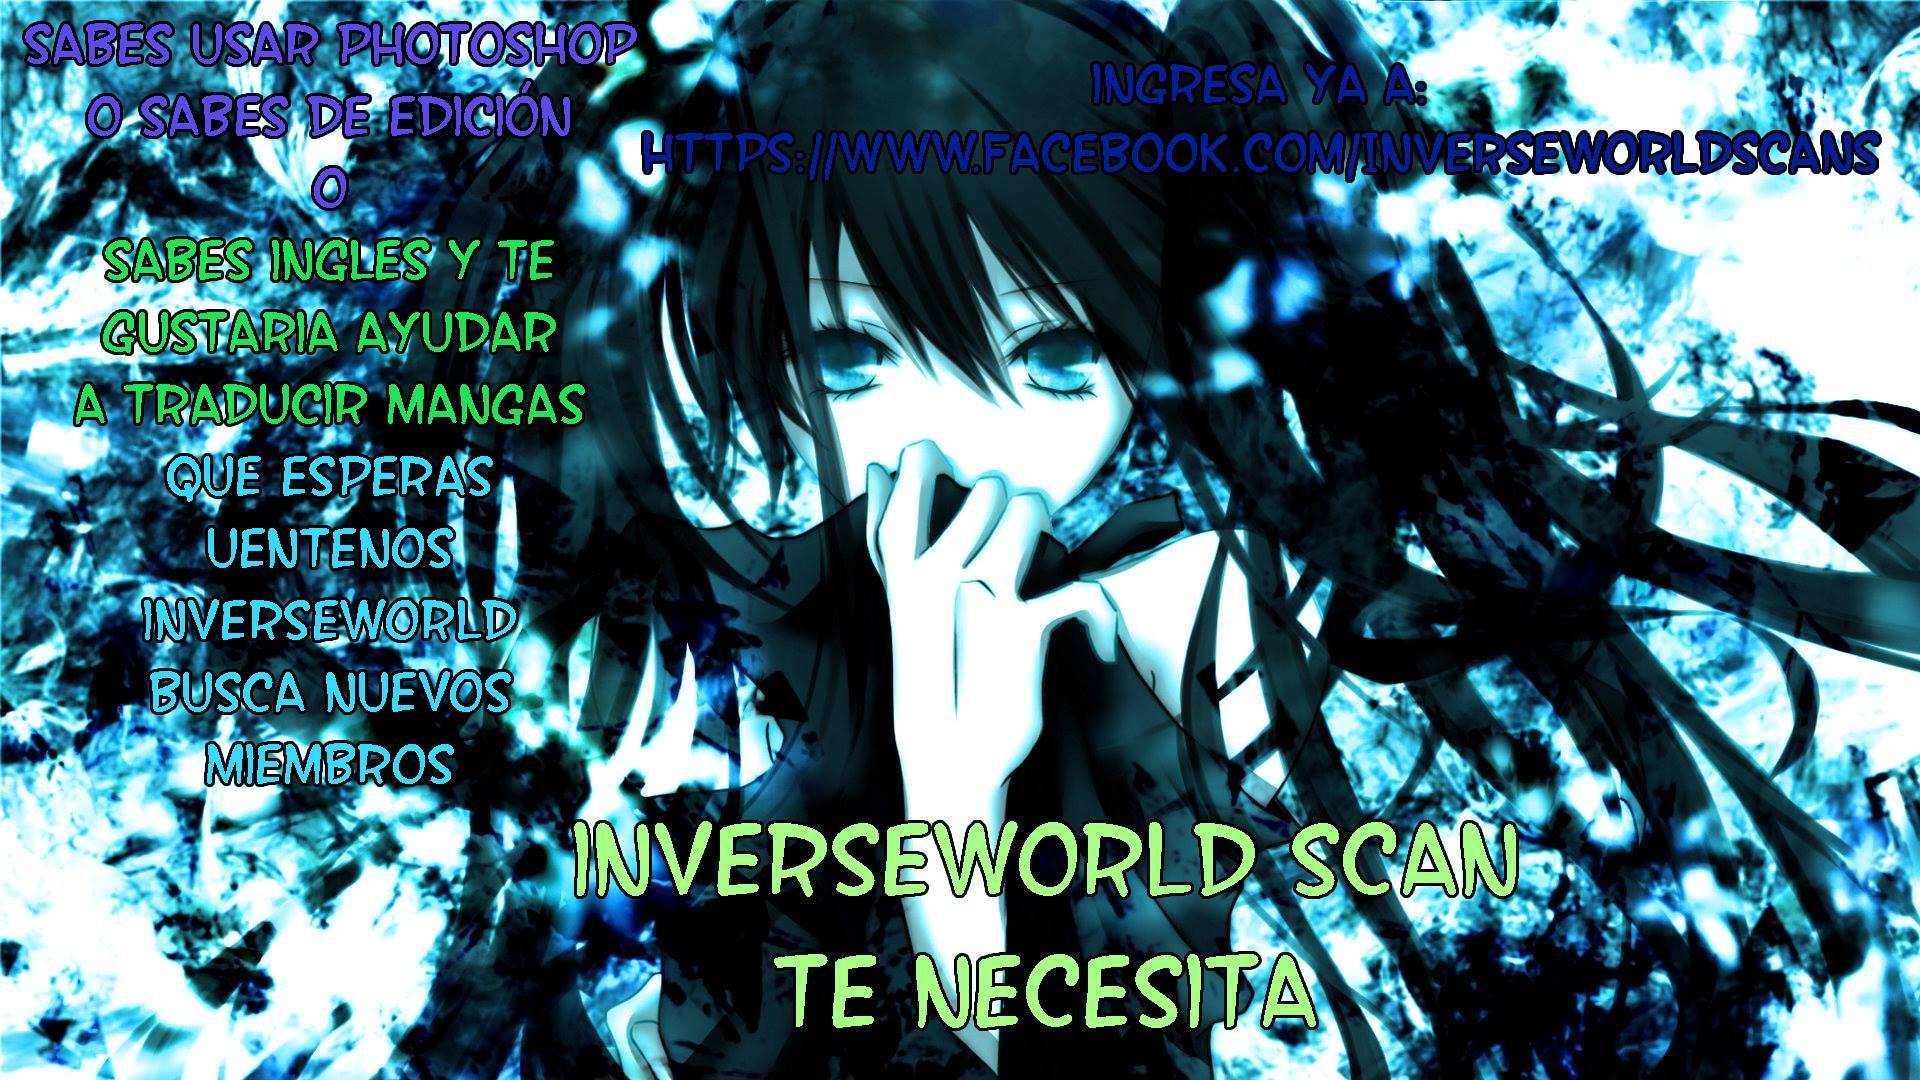 http://c5.ninemanga.com/es_manga/18/16210/415314/ed556265816011ba76a53e5cf54450cf.jpg Page 1